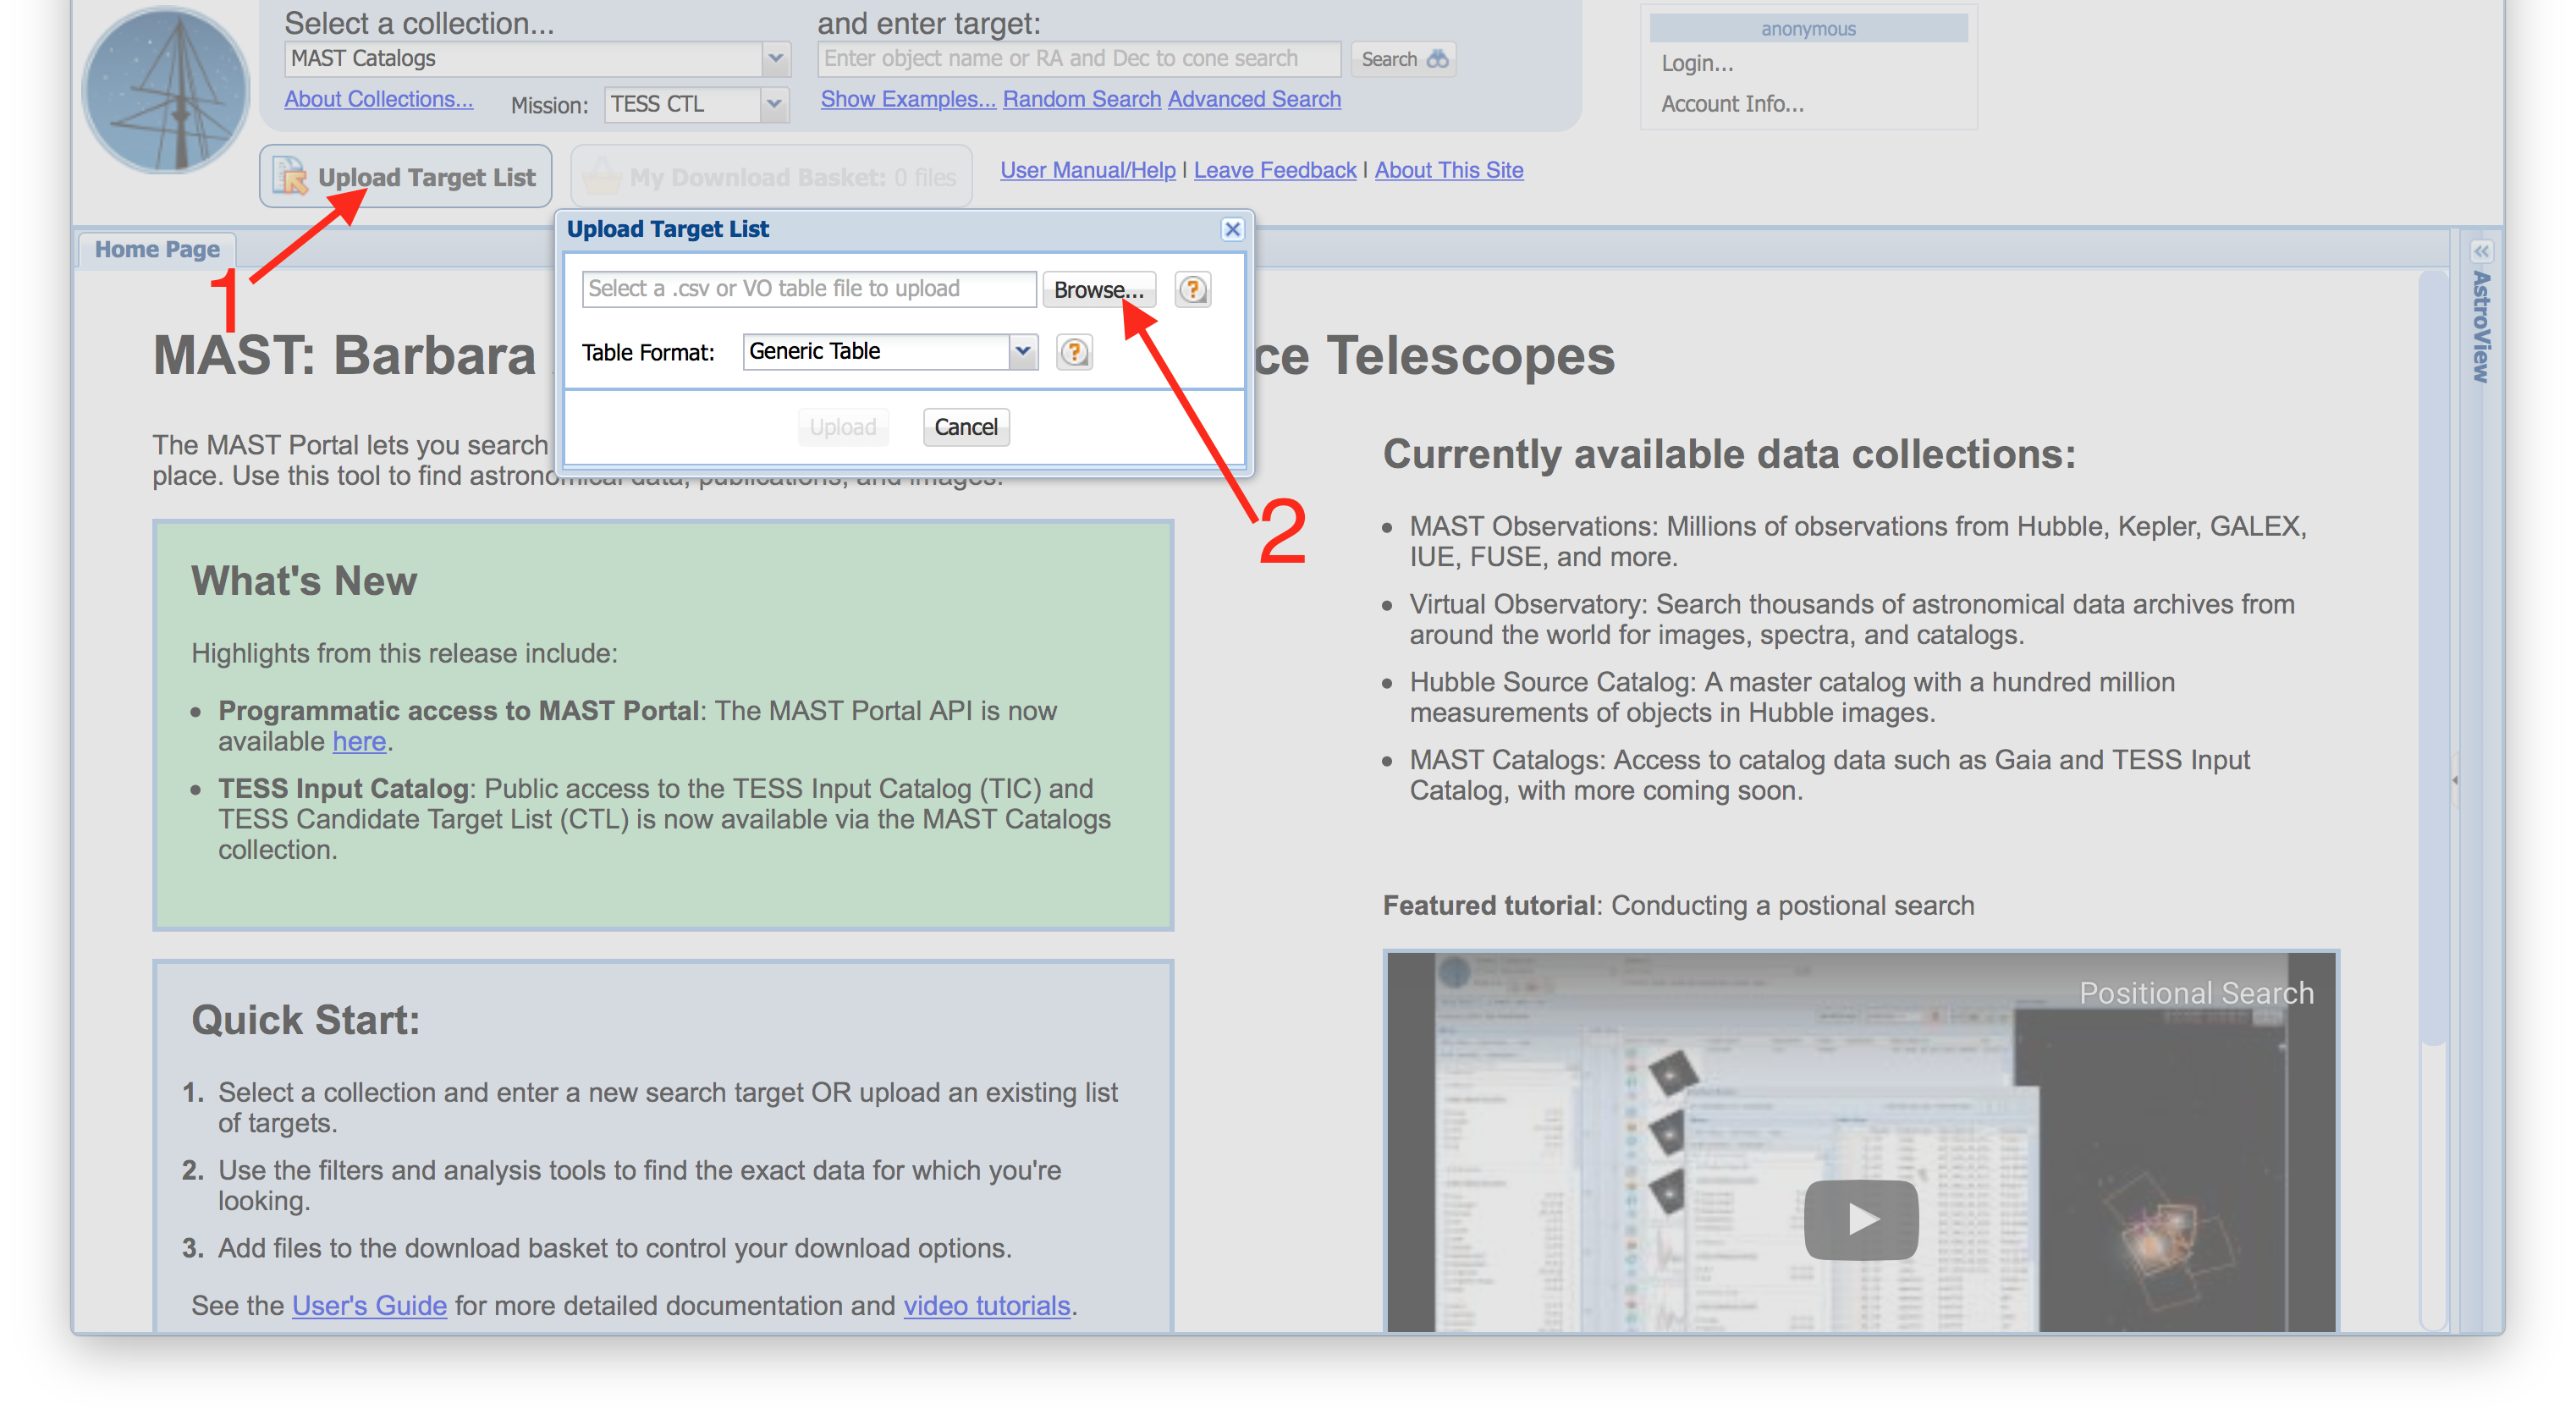 TIC Tutorial - Uploading A Target List